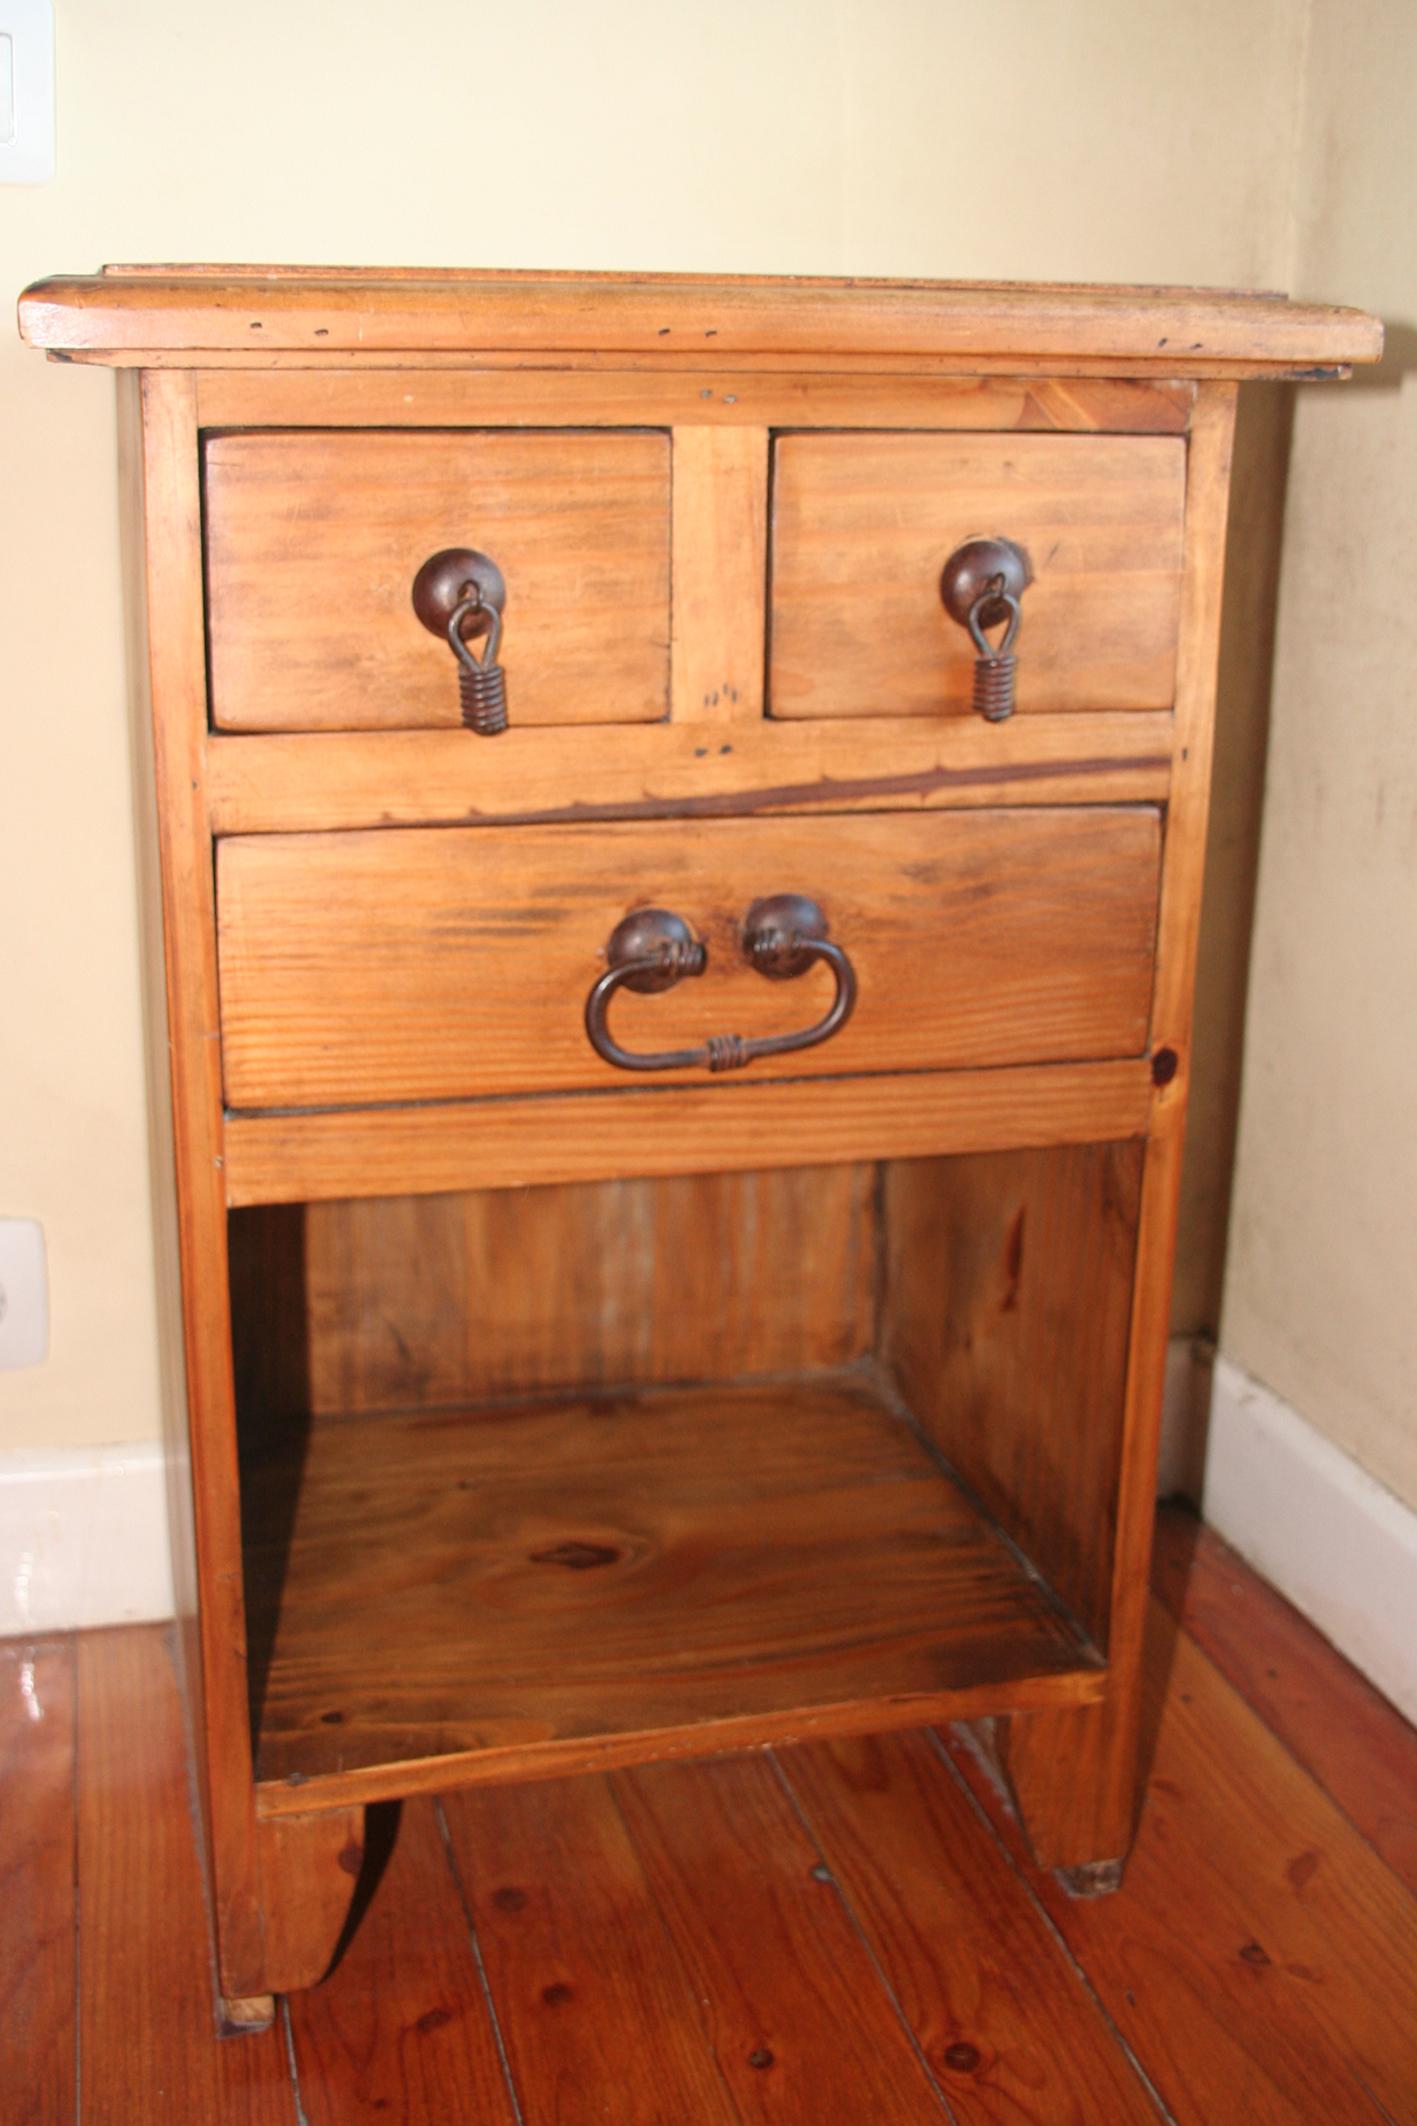 Salgai Se Vende Vender Salgai Muebles Rusticos Teka Madera # Muebles Oiartzun Mamut